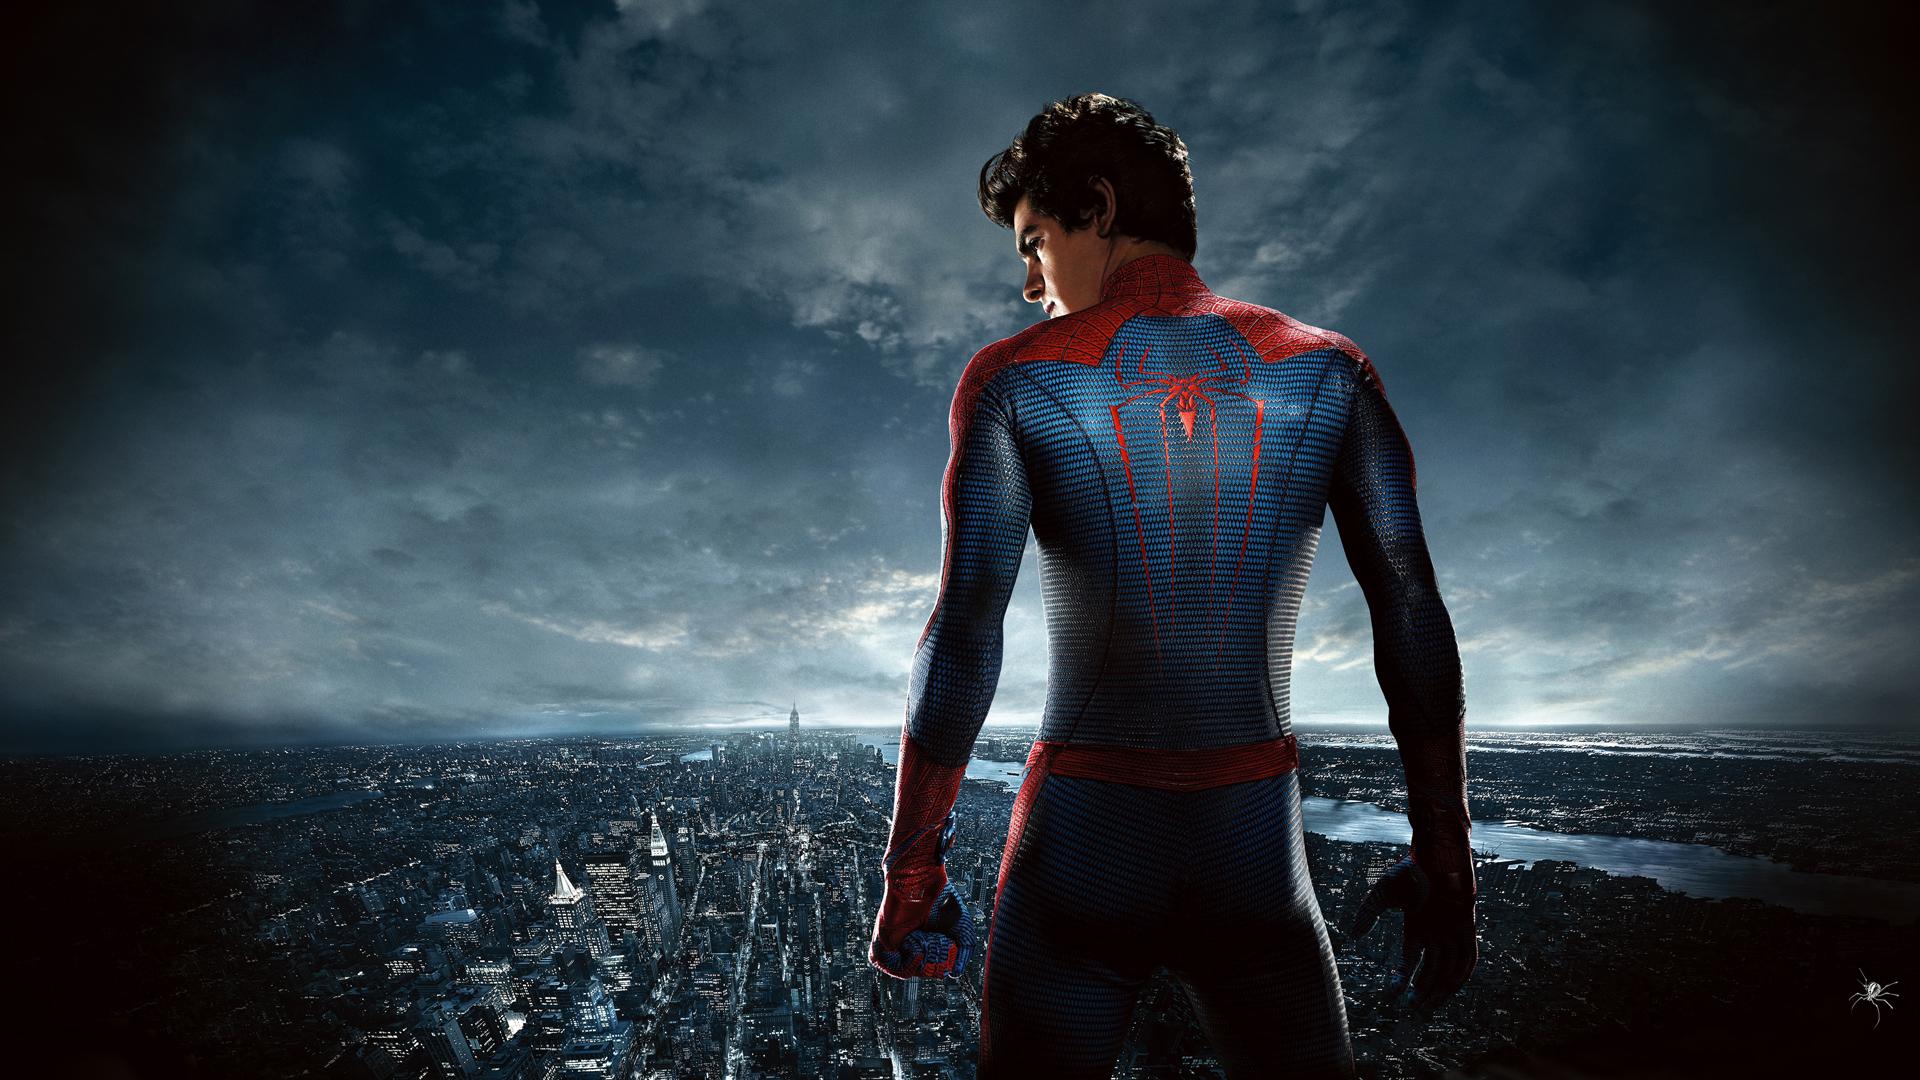 Free Download Spider Man Wallpaper High Definition High